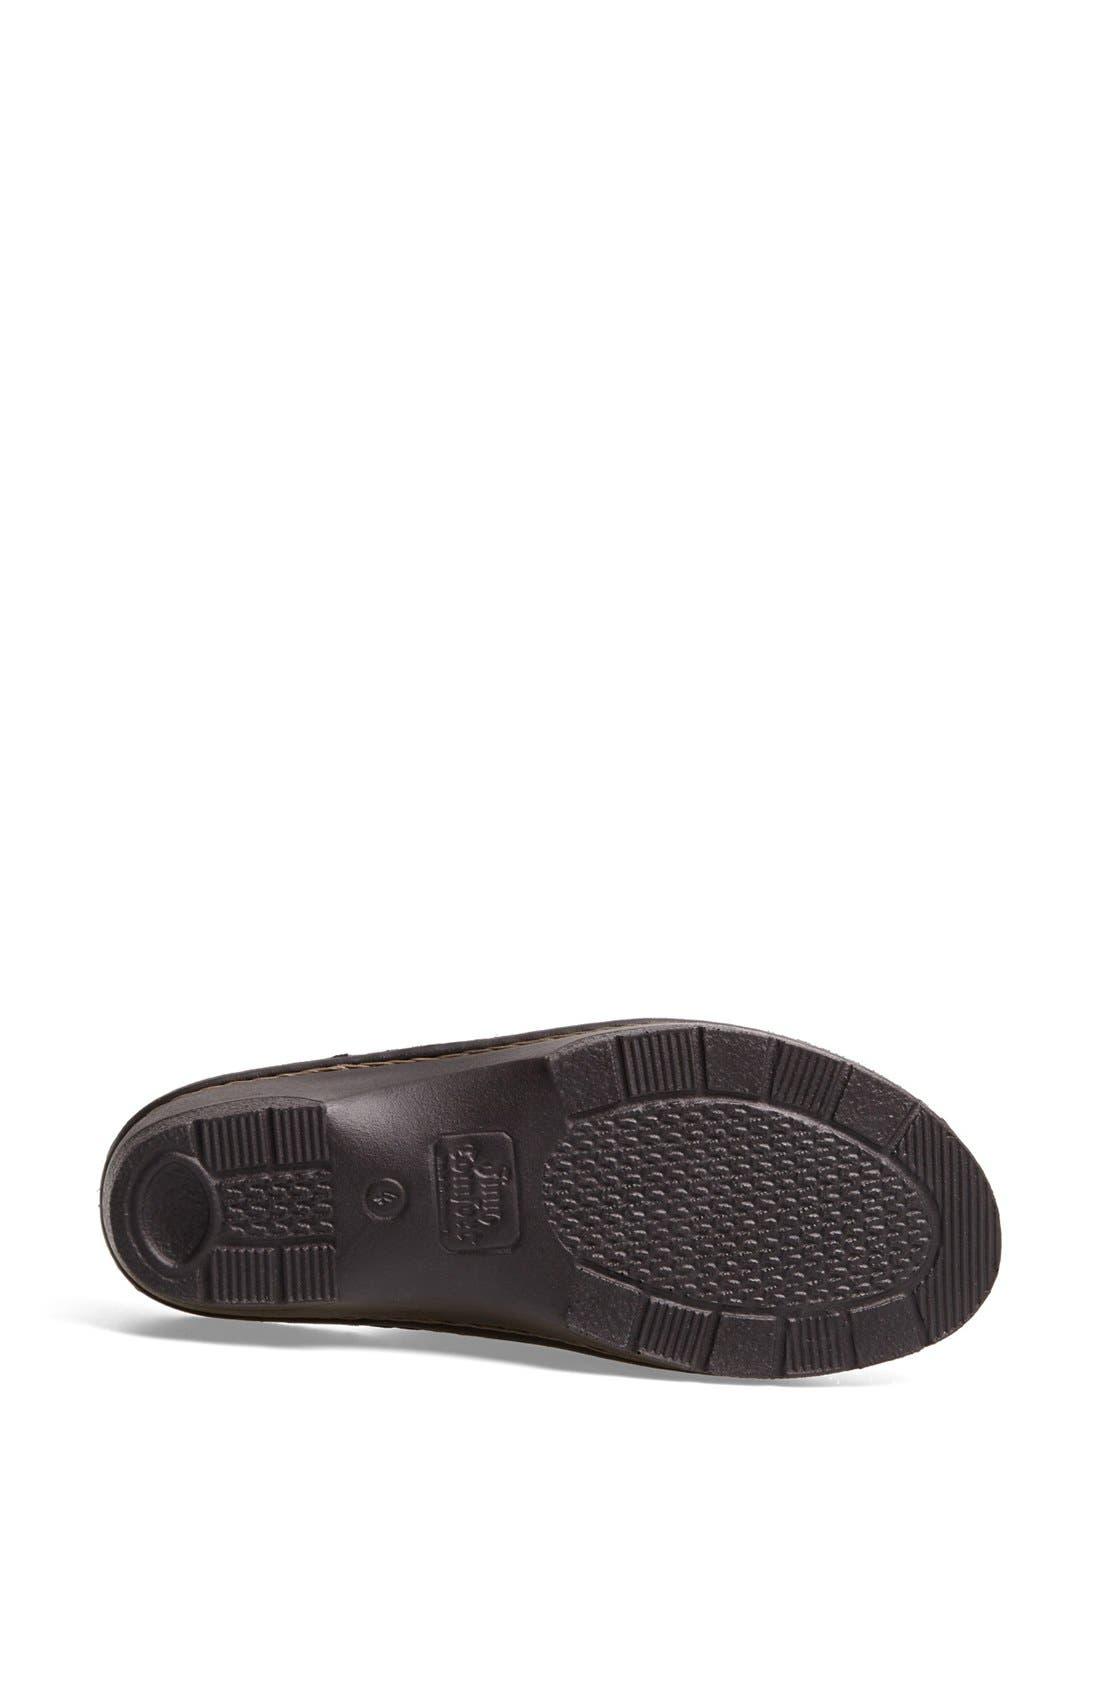 'Tilburg' Leather Sandal,                             Alternate thumbnail 4, color,                             Black